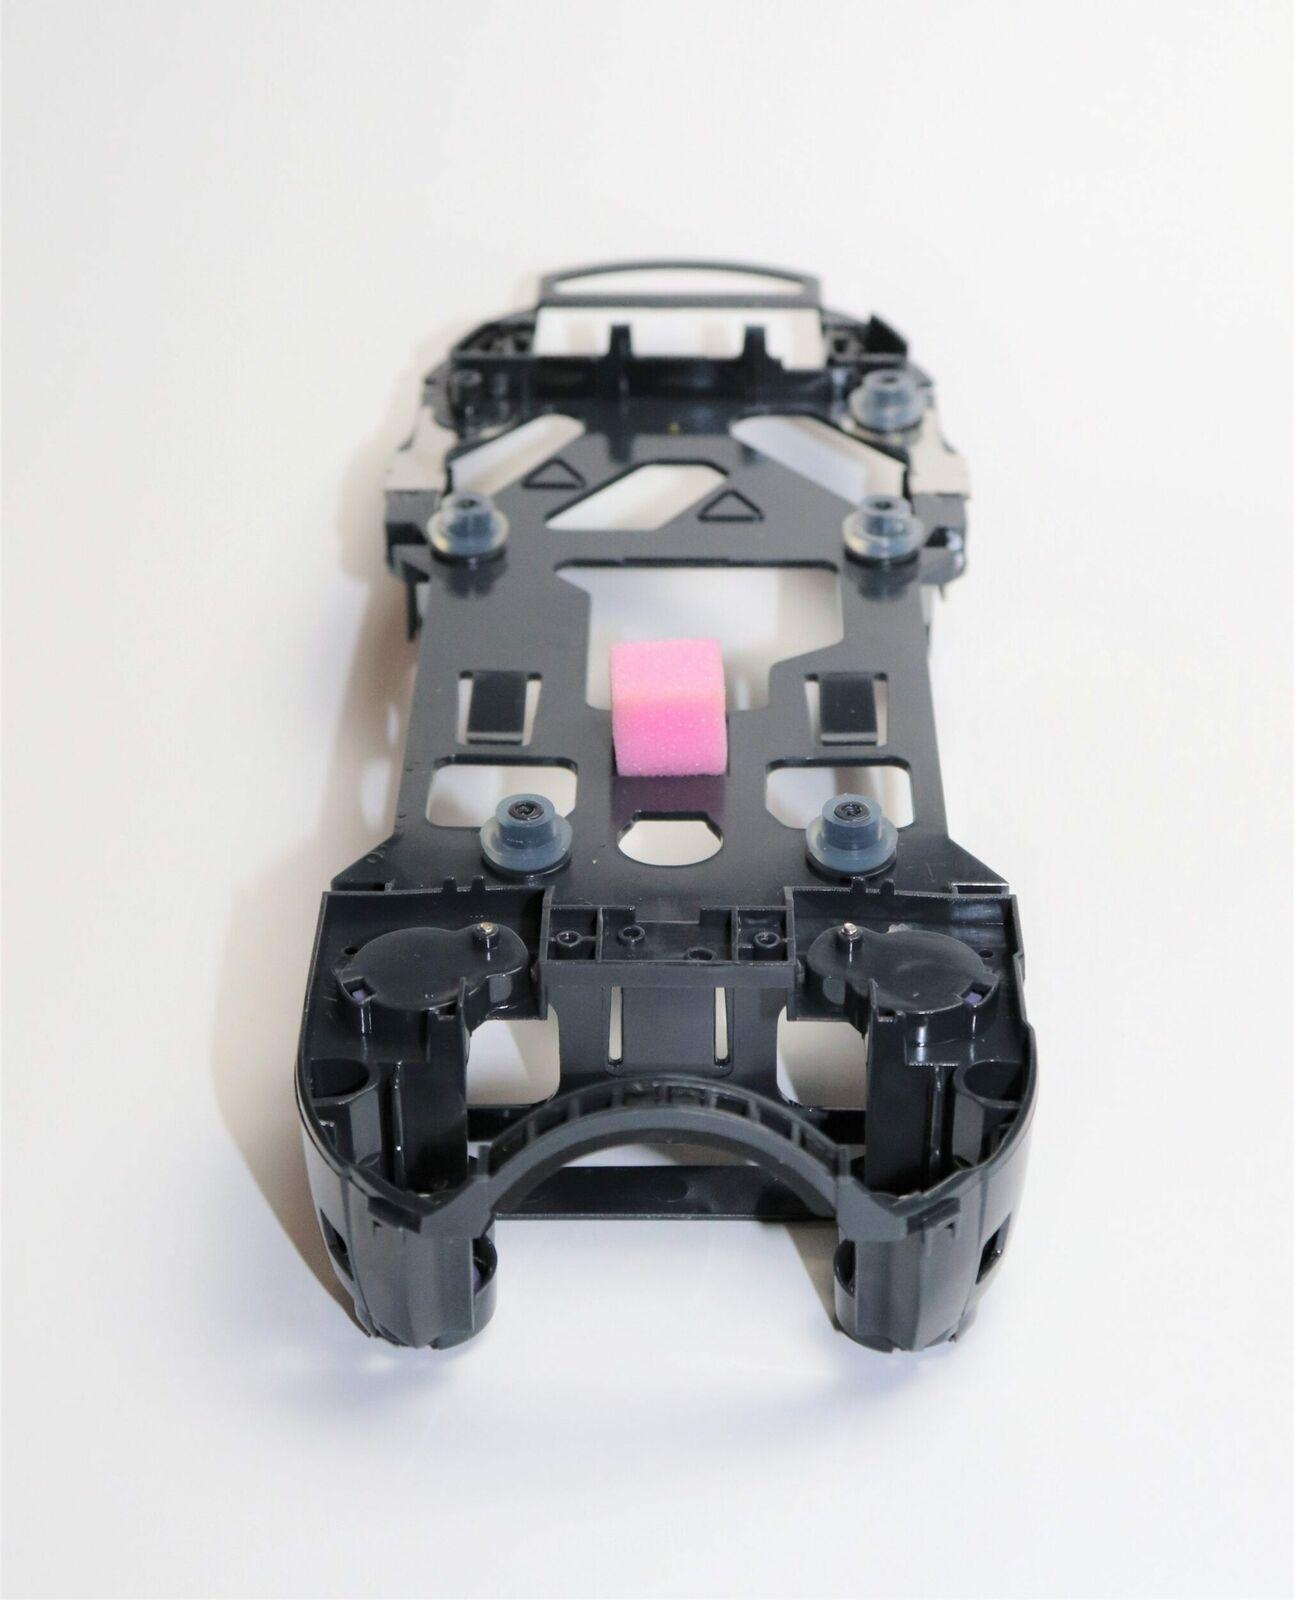 Original GoPro Karma Middle Body / Shell - Genuine